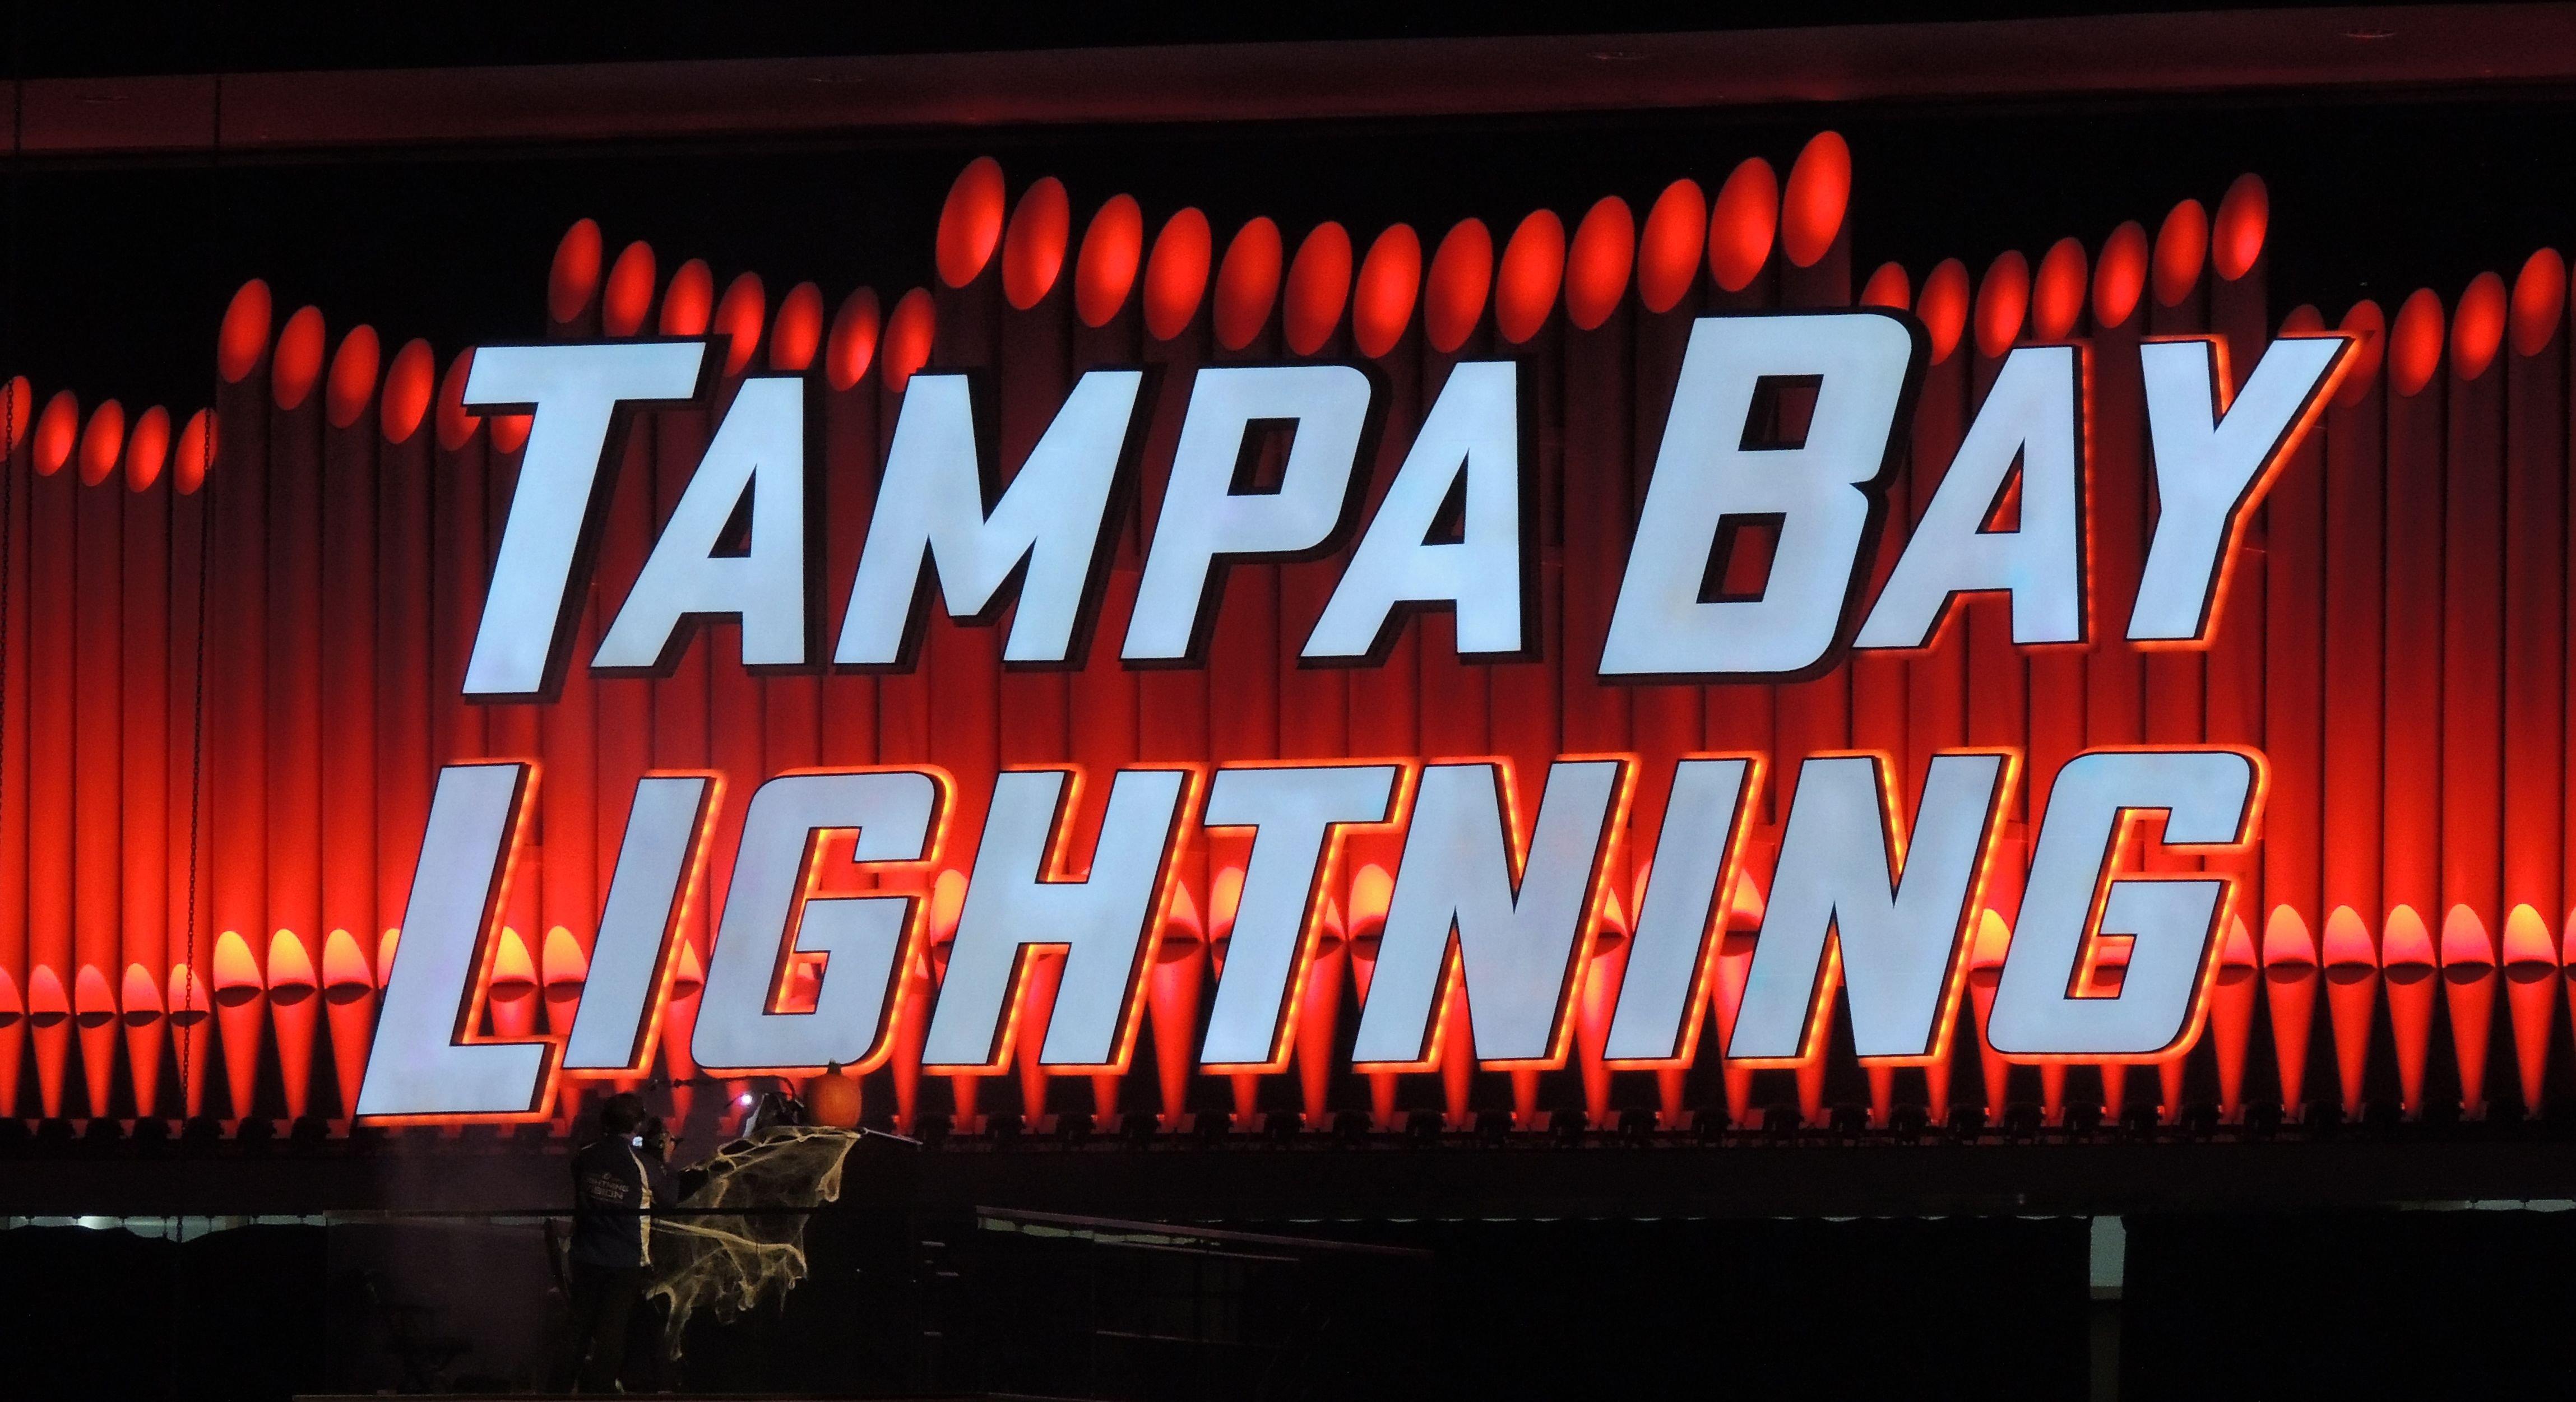 TAMPA BAY LIGHTNING nhl hockey 34 wallpaper 4596x2502 349215 4596x2502